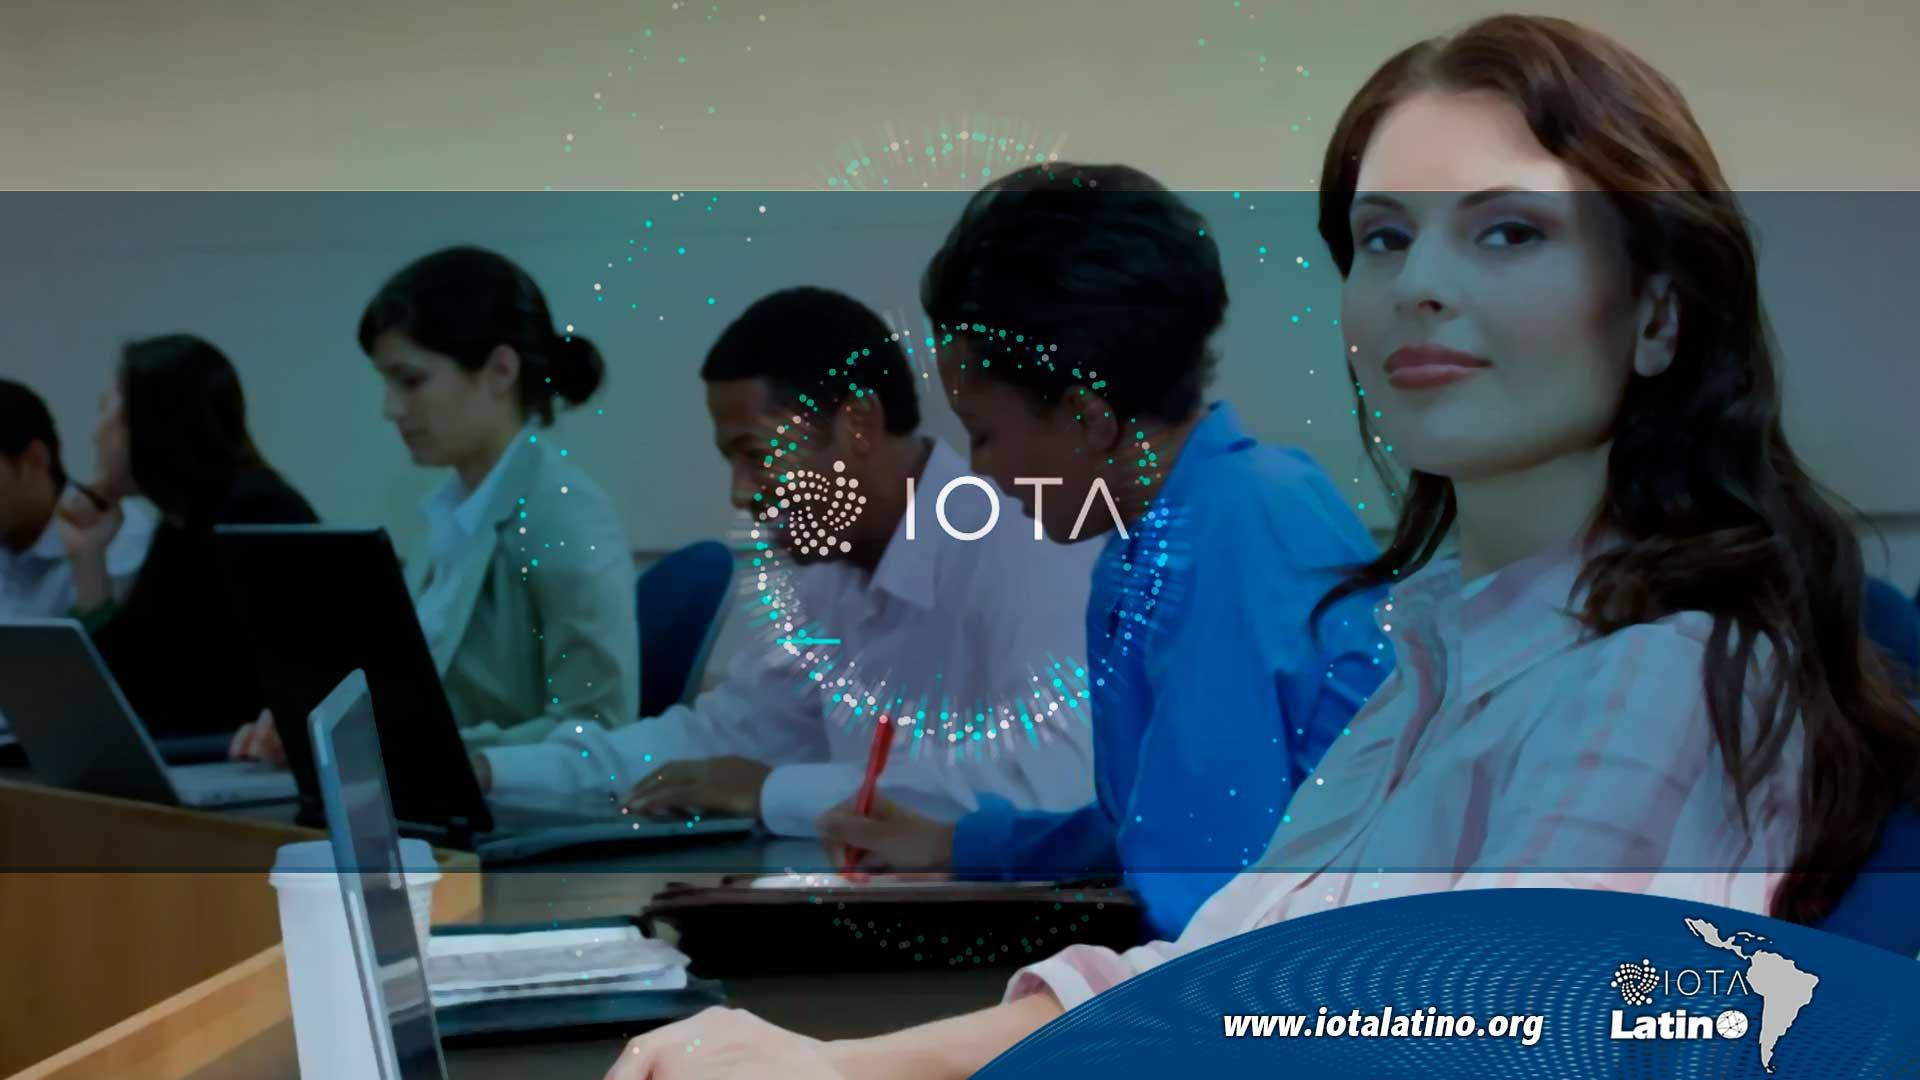 sensores con IOTA - IOTA Latino